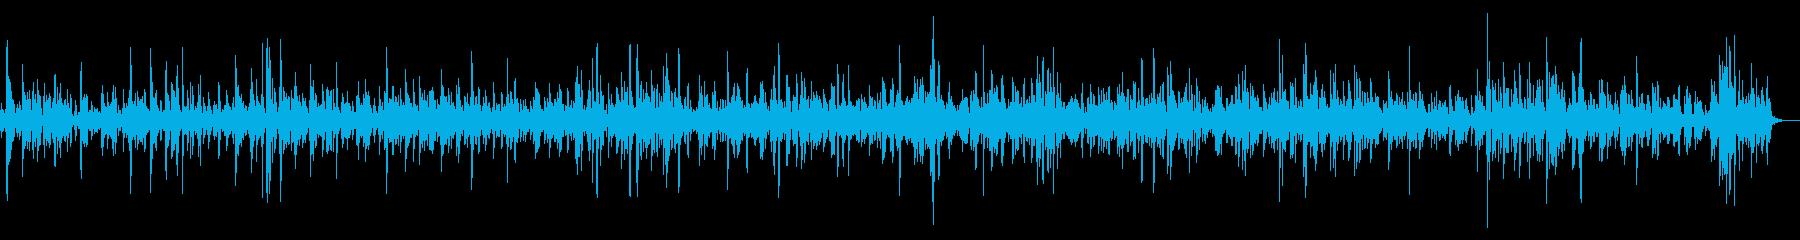 JAZZピアノ|店舗配信・映像制作BGMの再生済みの波形